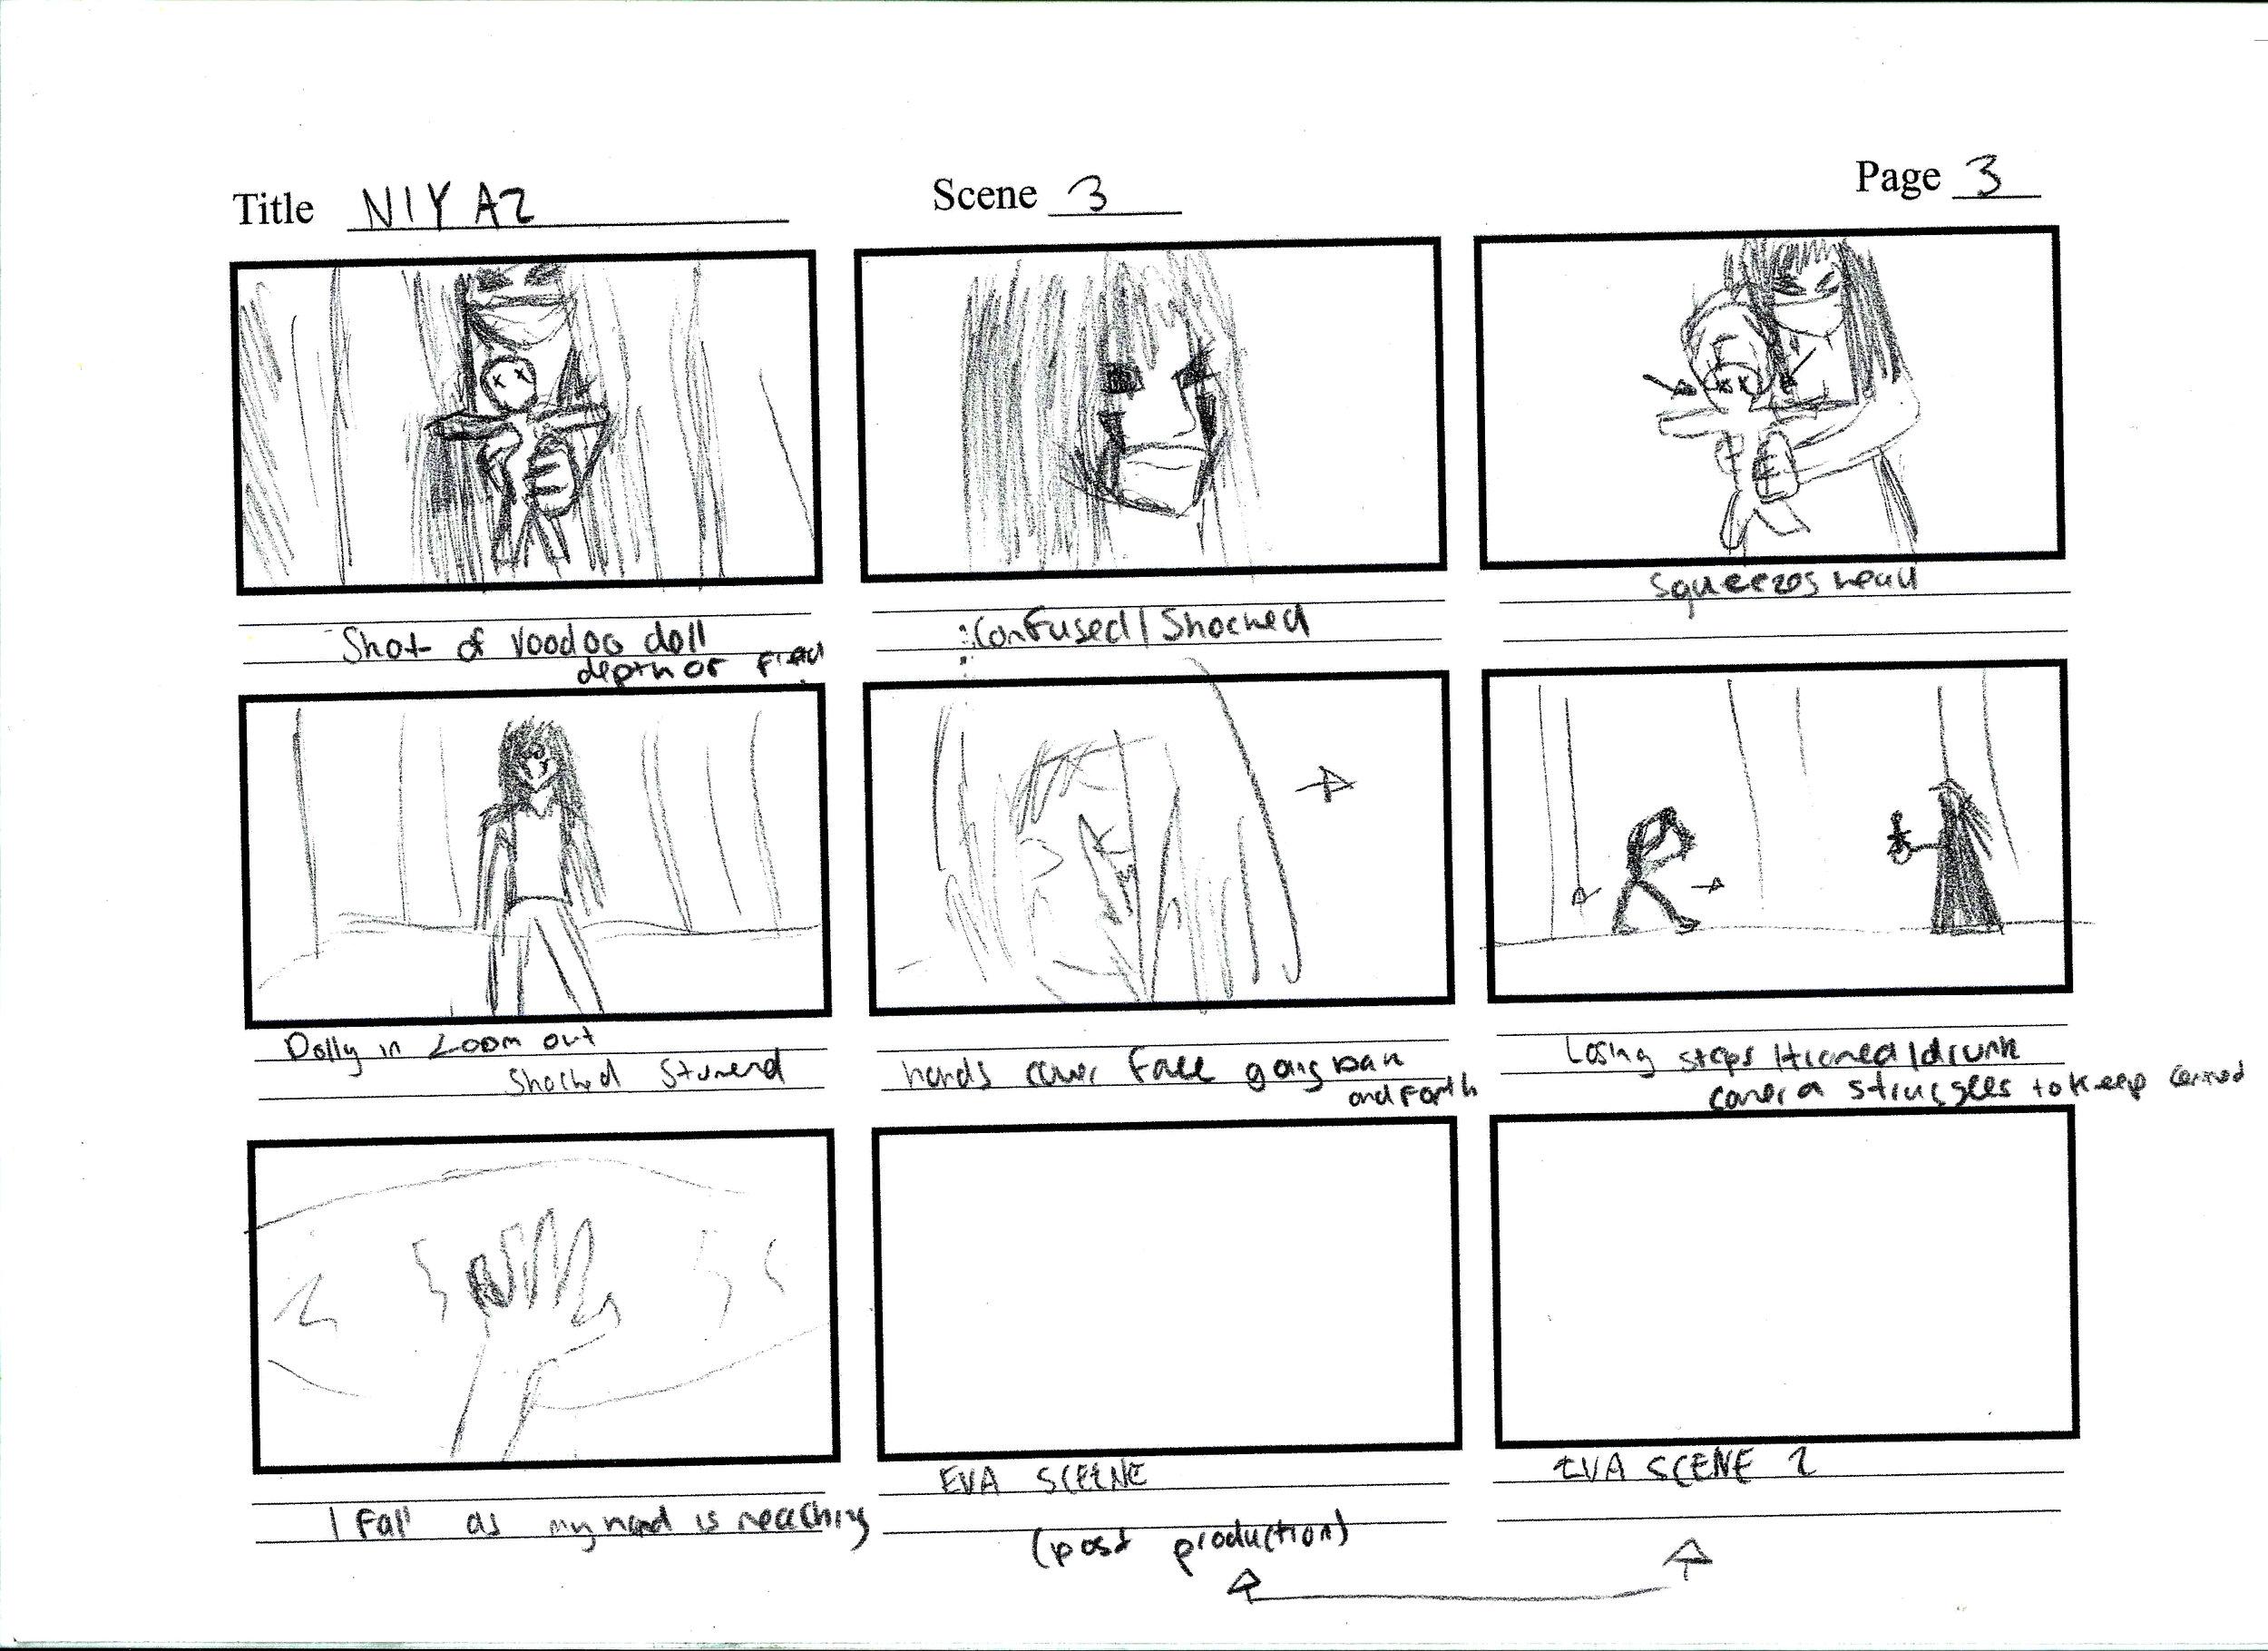 Niyaz storyboard 3.jpg